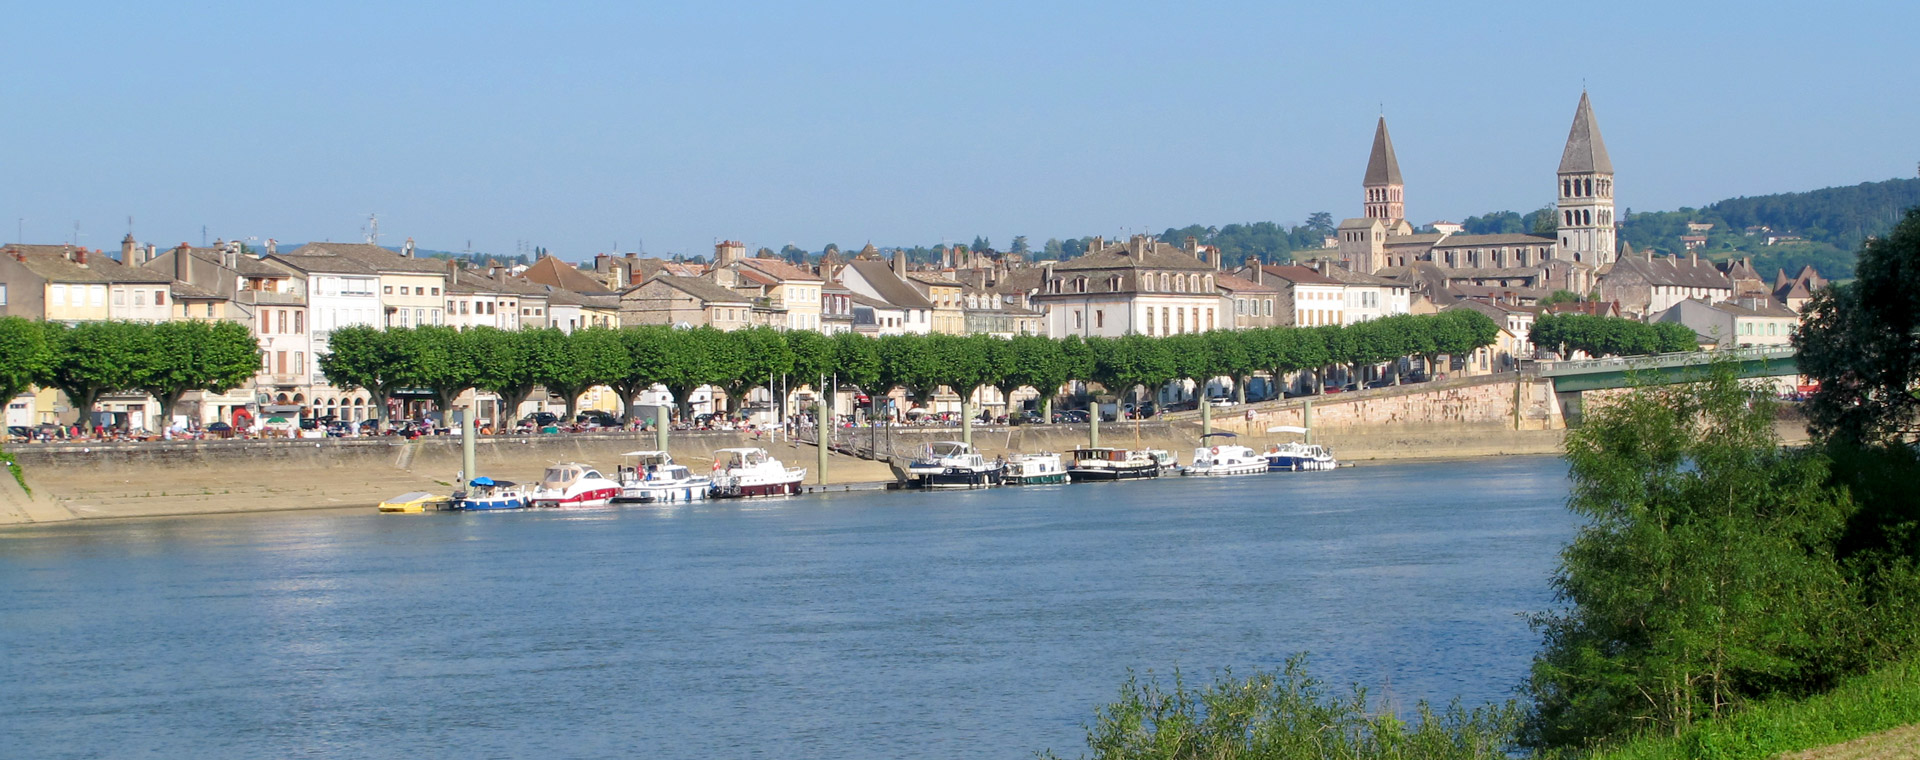 Image Bourgogne du Sud : grands crus et art roman